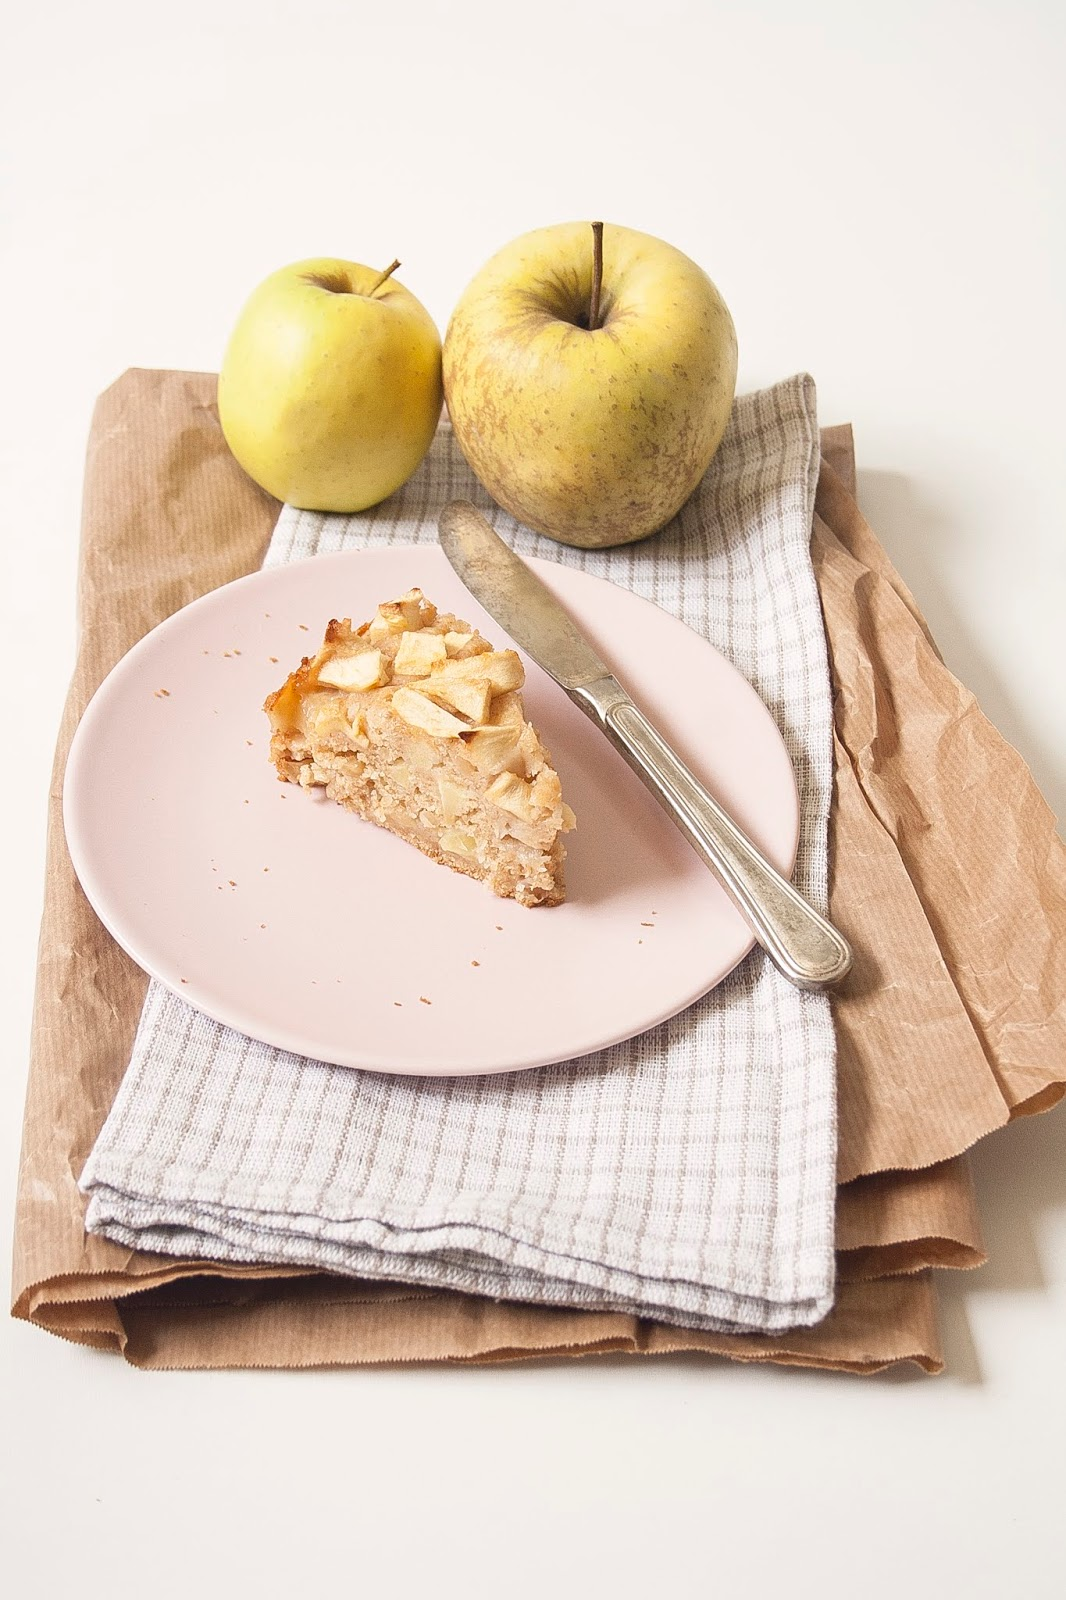 Torta di mele light senza burro e senza uova